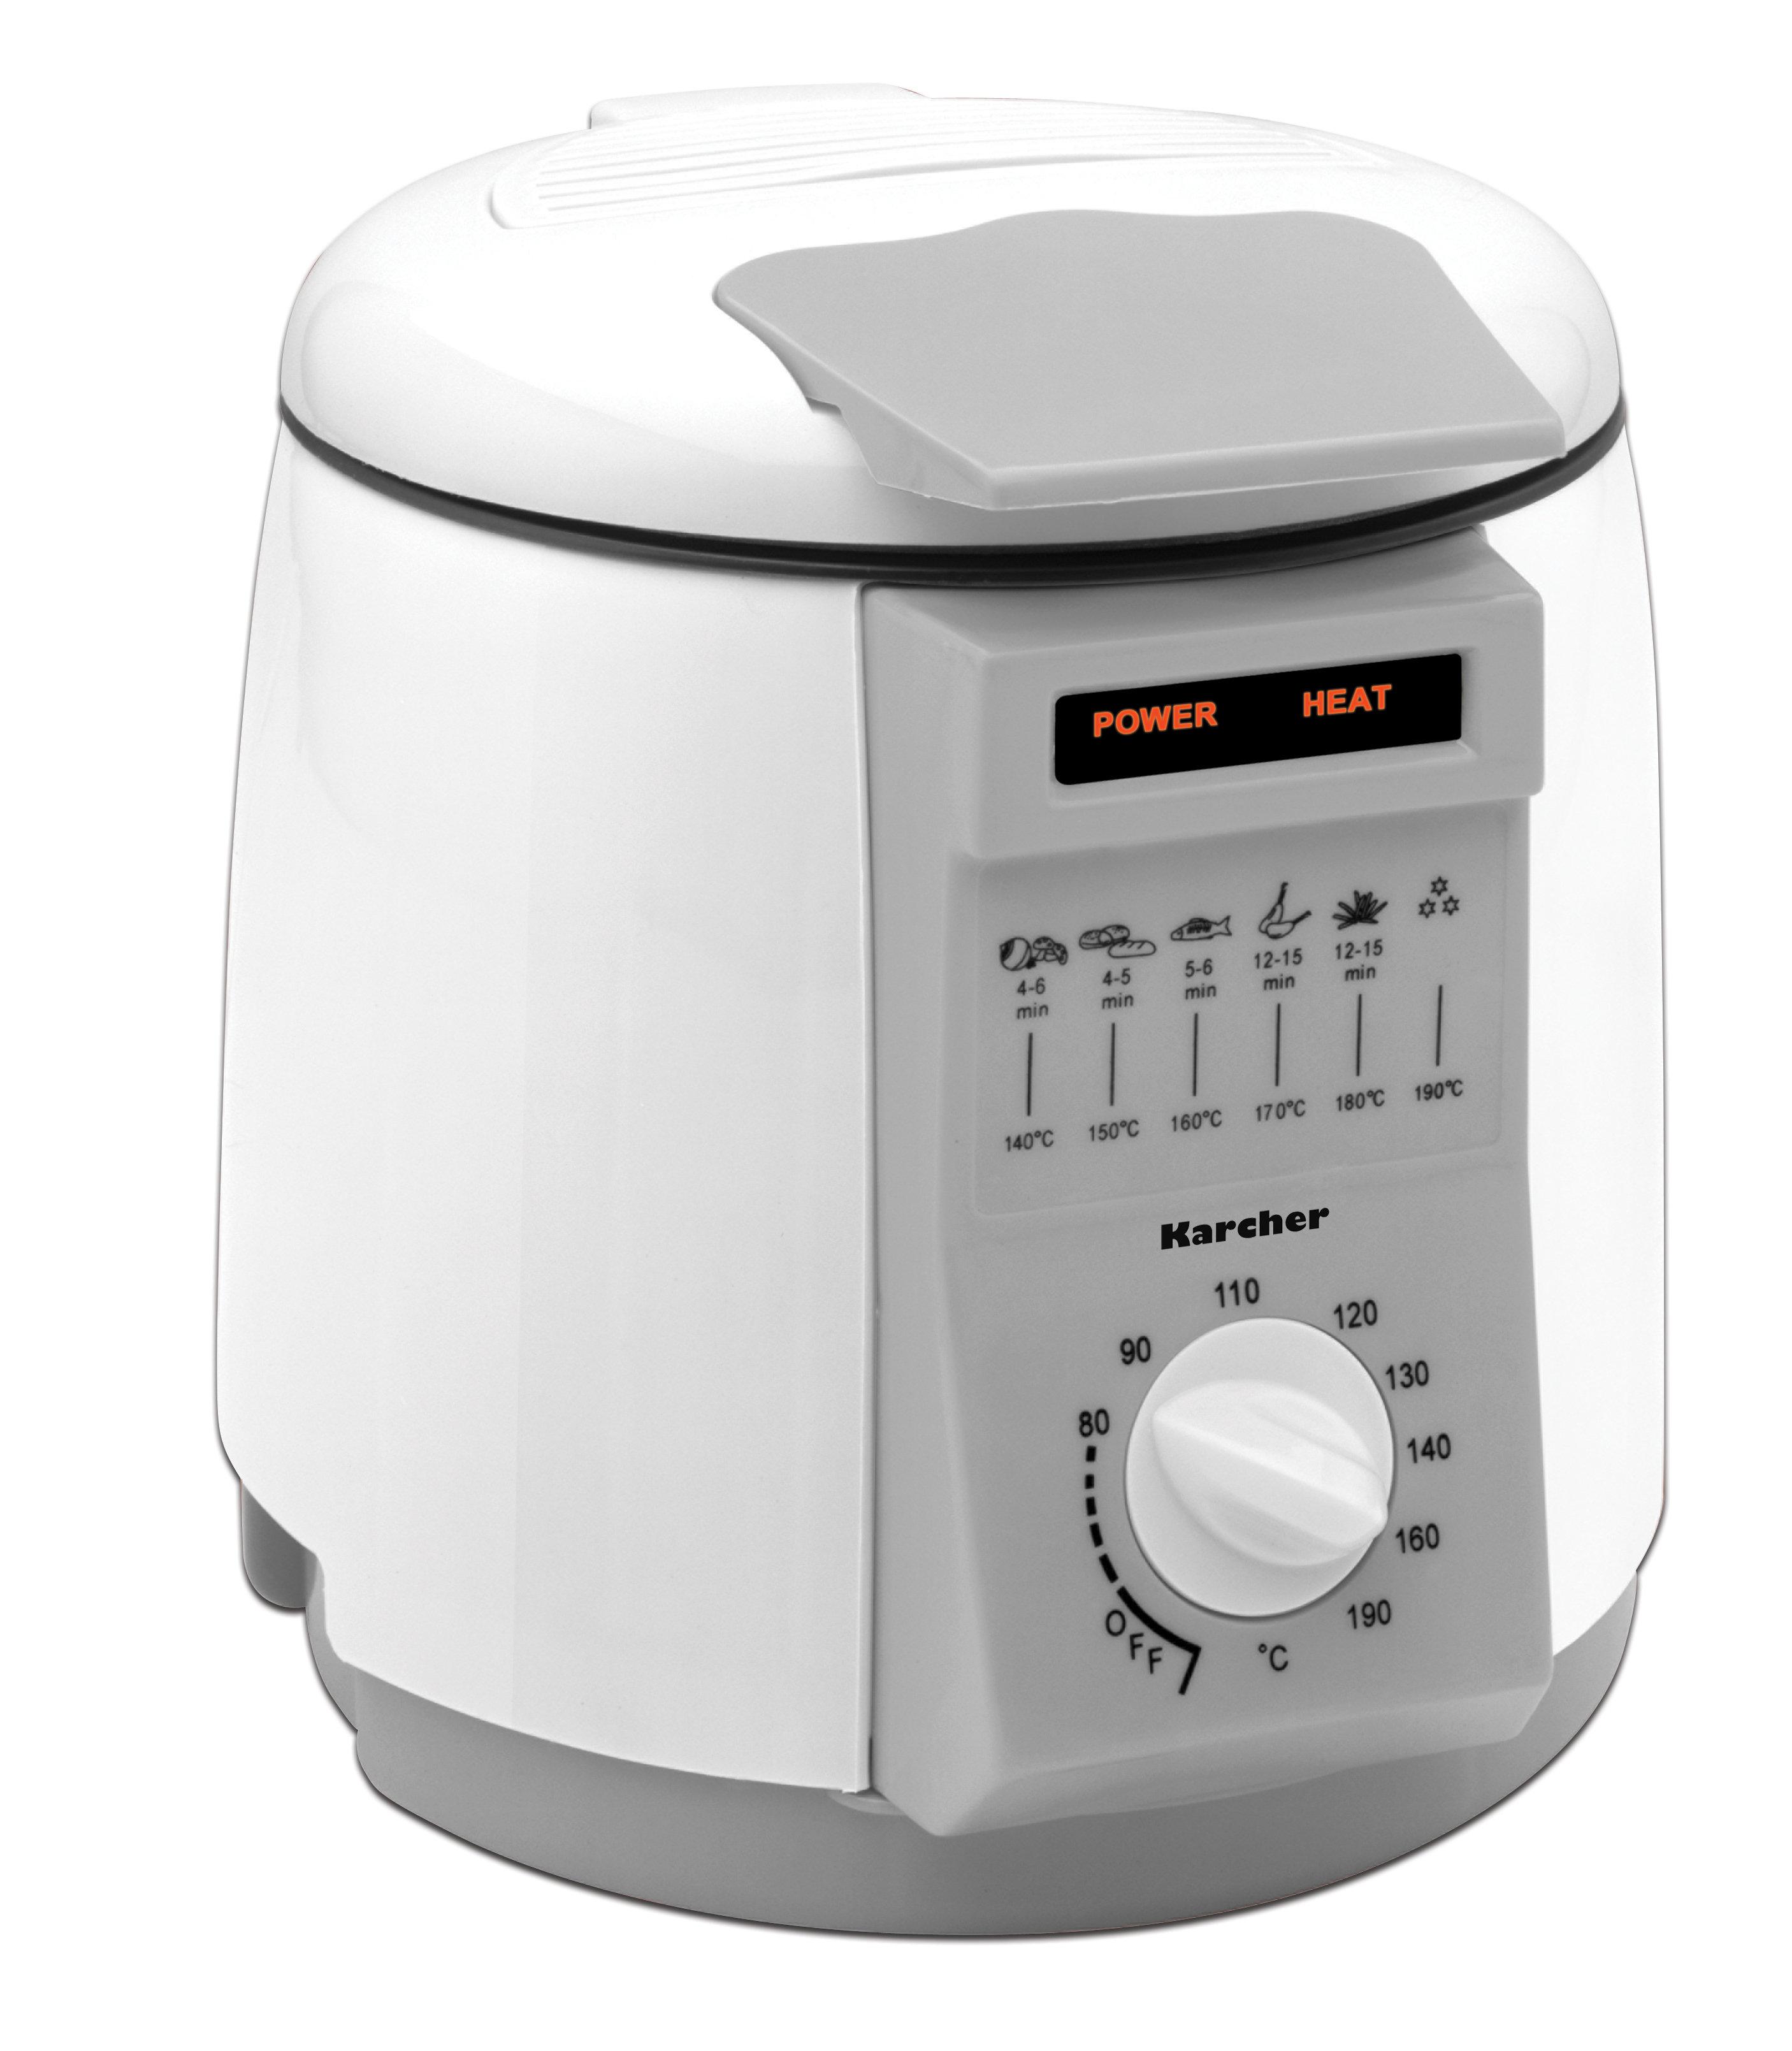 karcher 112983 set mini friggitrice e fonduta 2 in 1 colore bianco casa e cucina. Black Bedroom Furniture Sets. Home Design Ideas